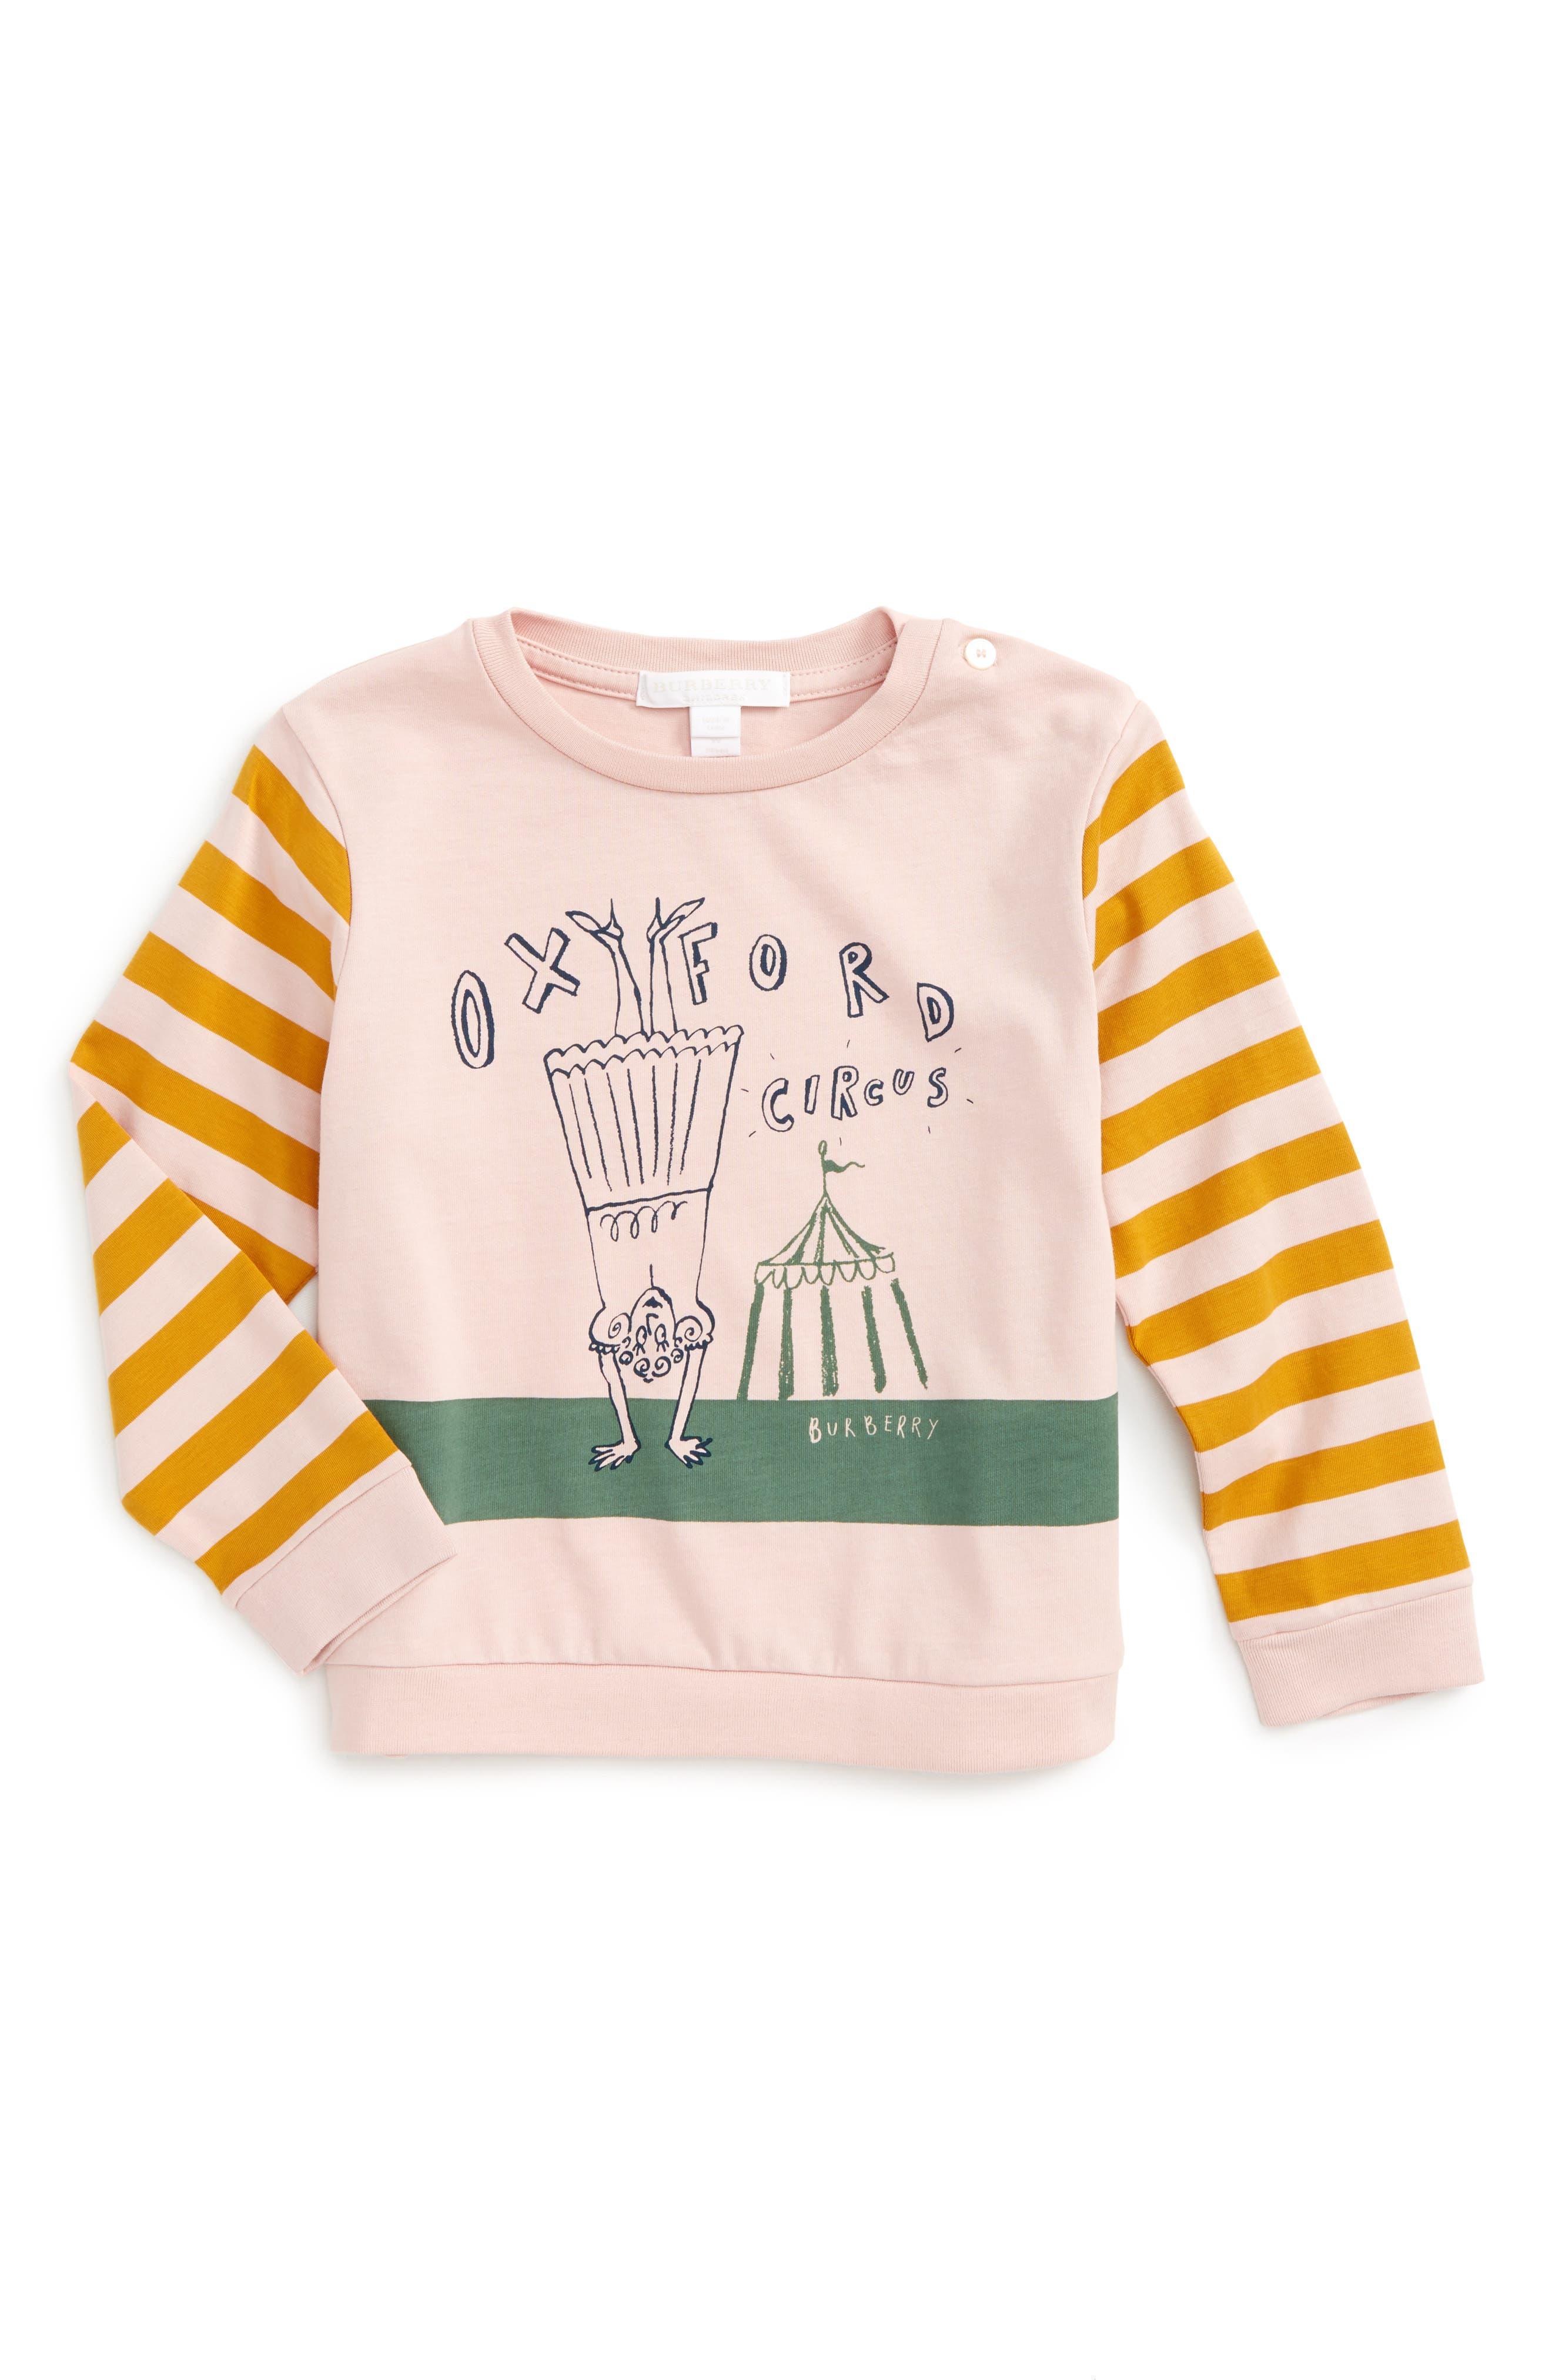 Main Image - Burberry London Icons Graphic Cotton Tee (Toddler Girls, Little Girls & Big Girls)